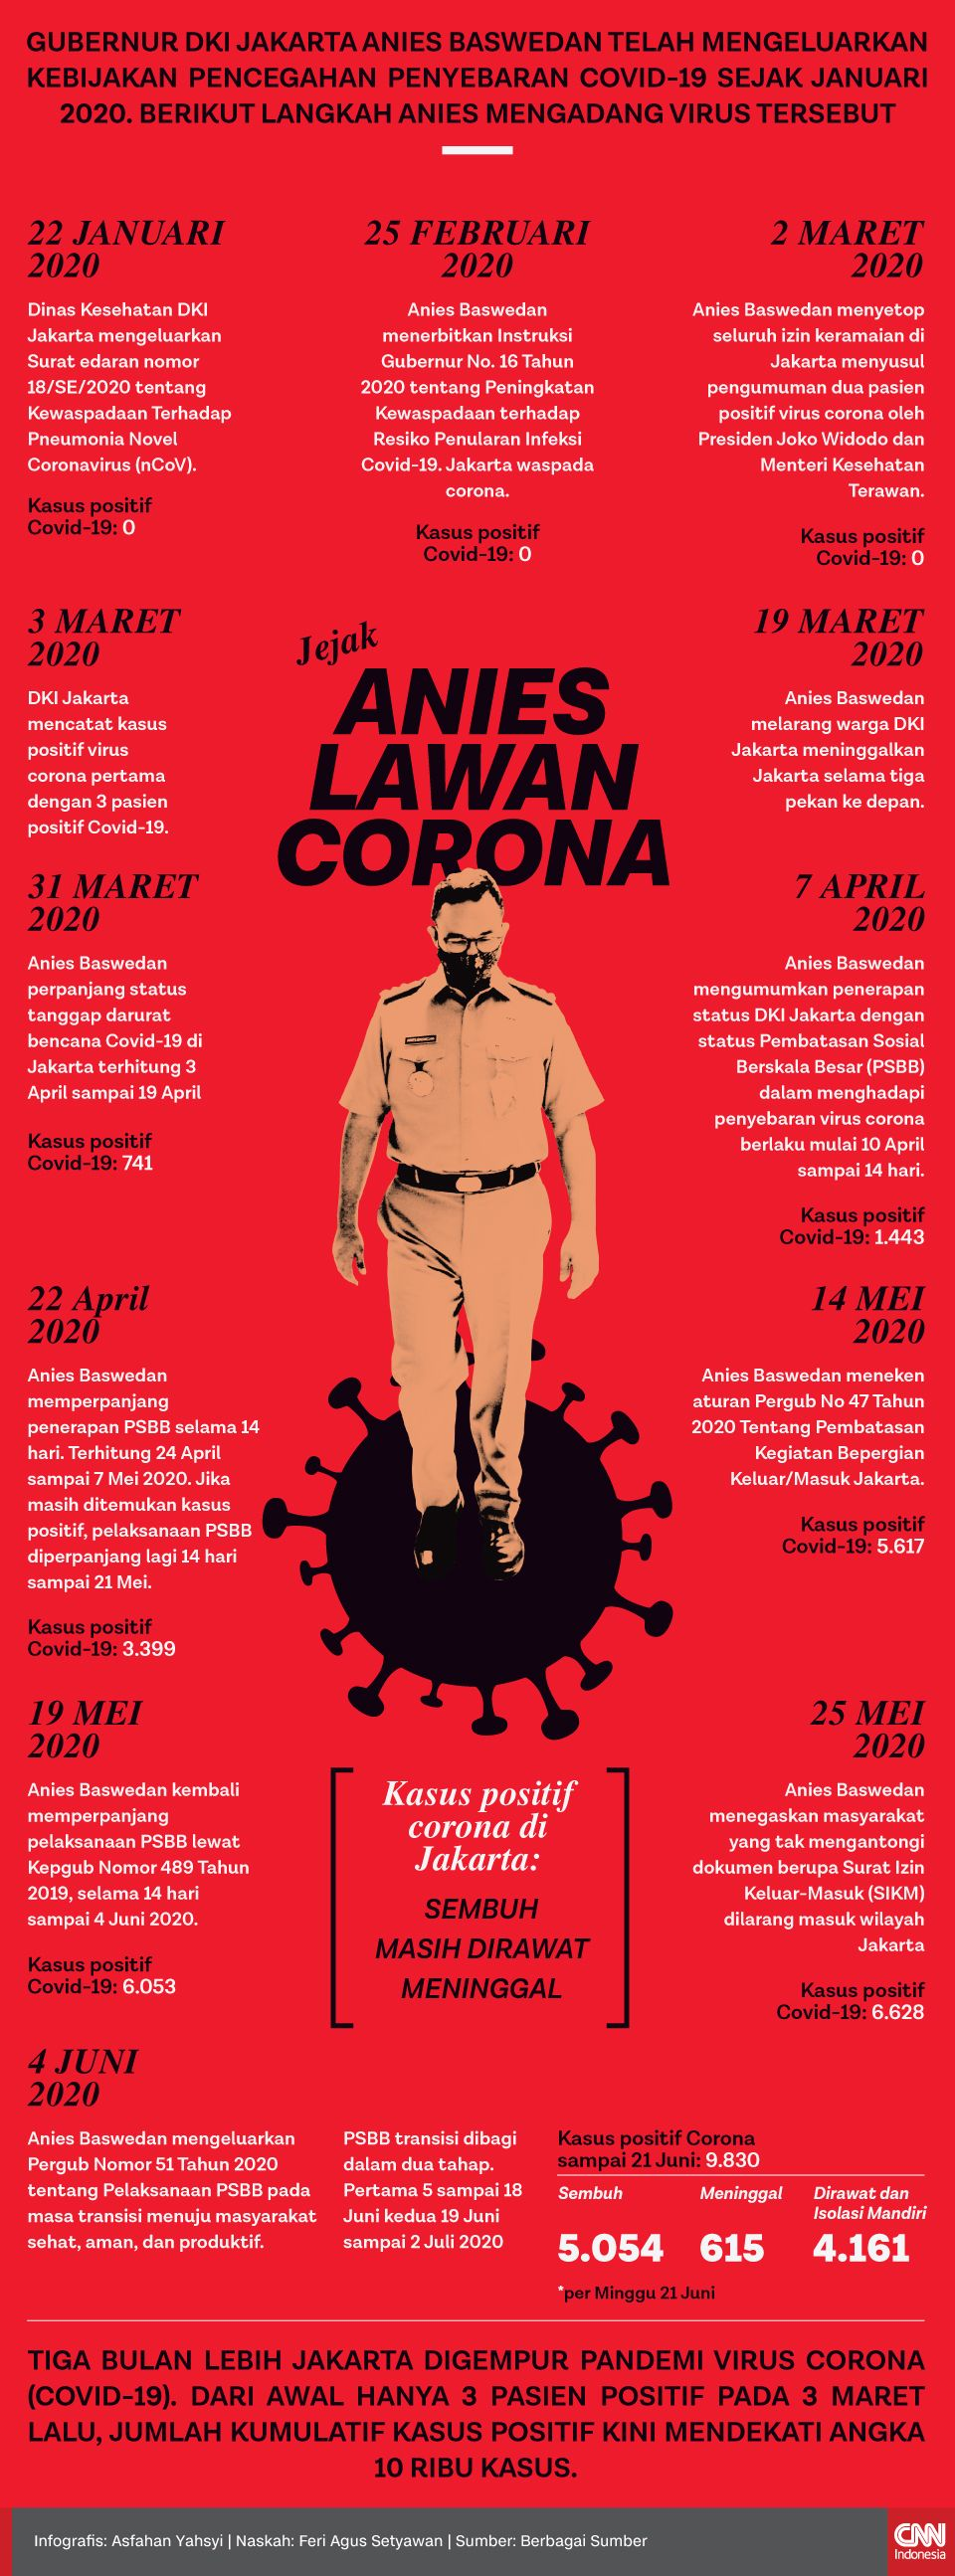 Infografis Jejak Anies Lawan Corona